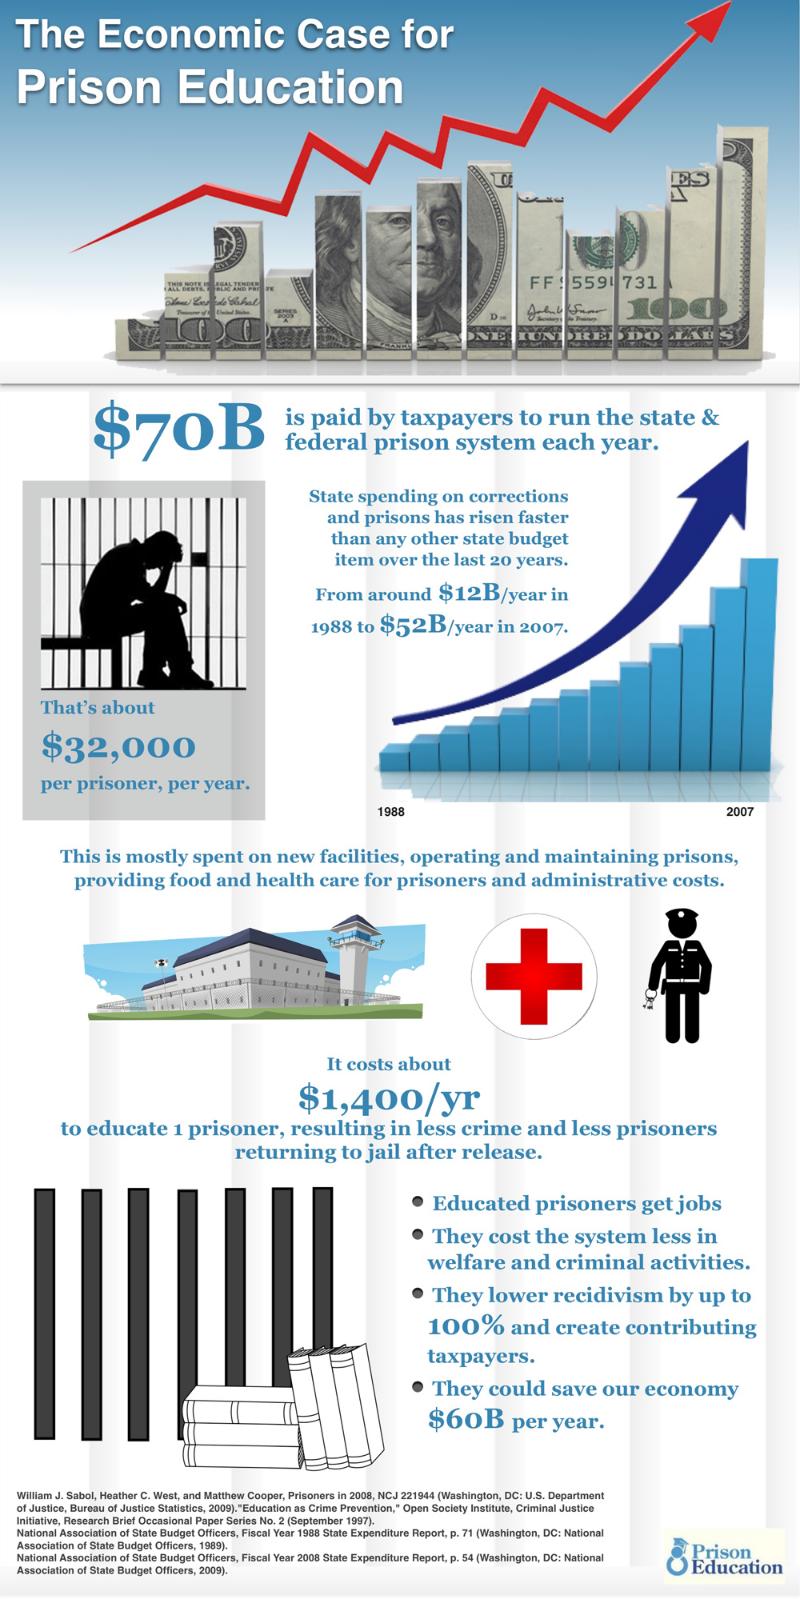 The economic case for prison education.